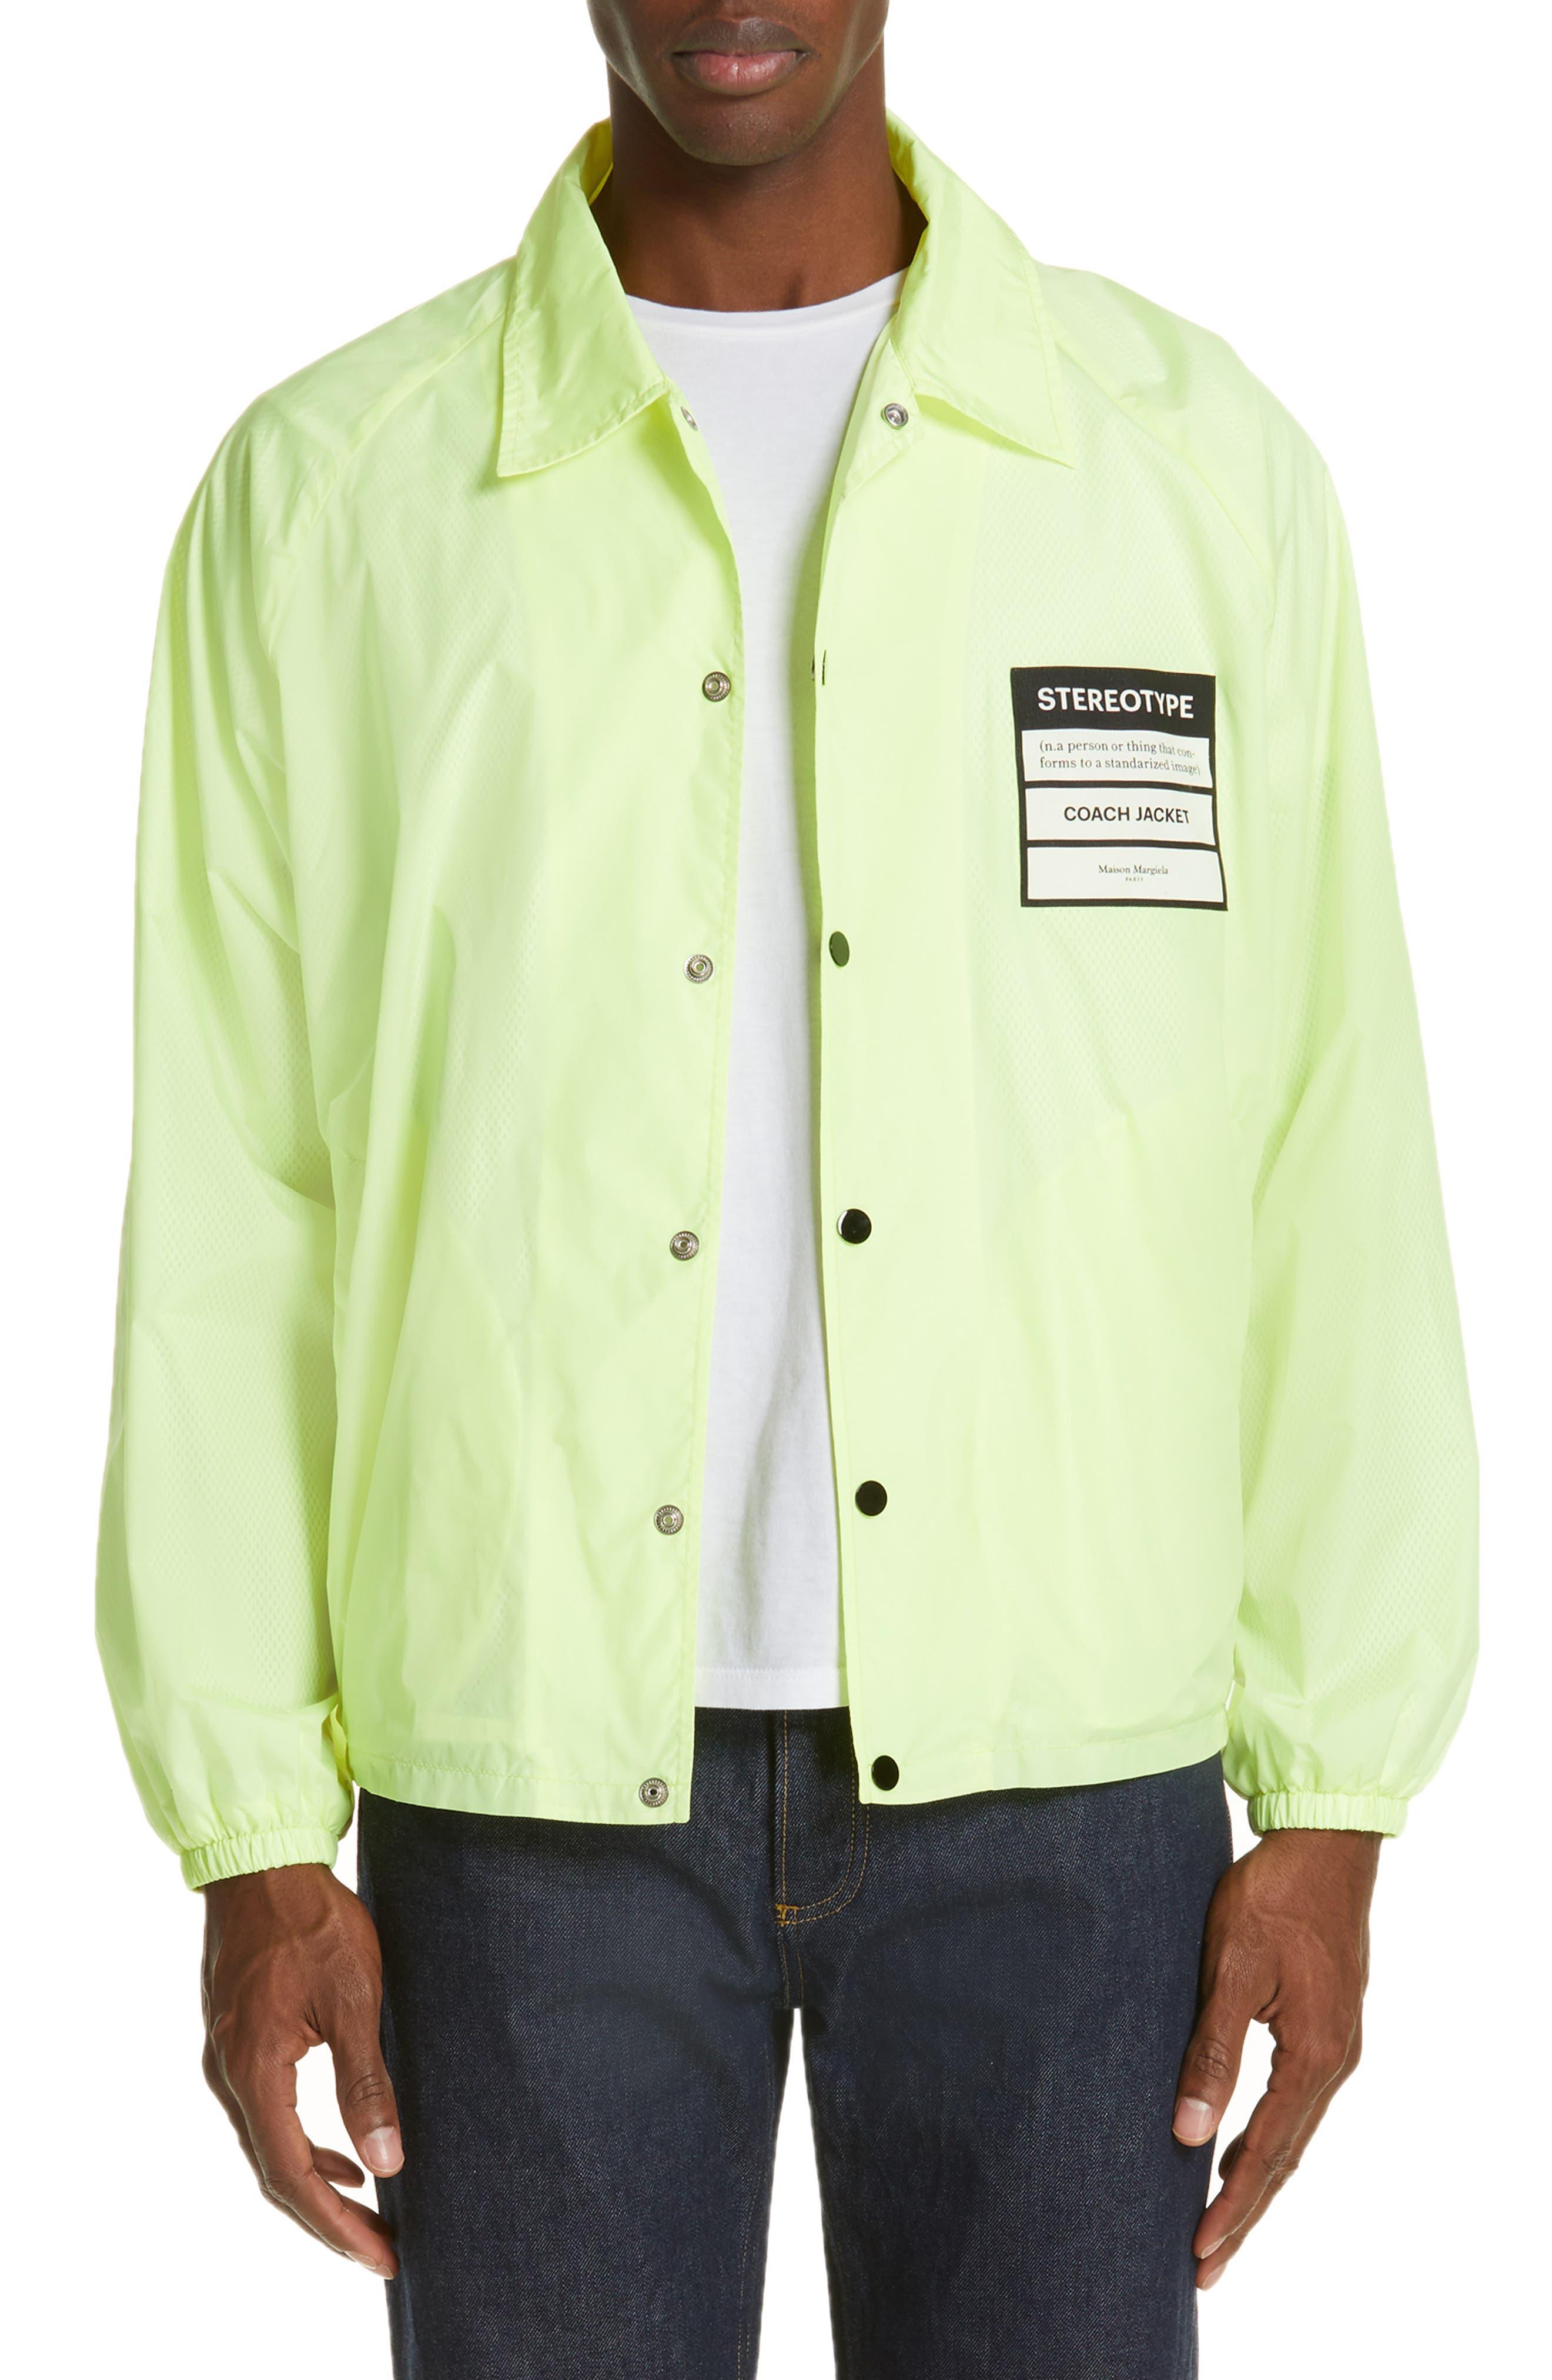 MAISON MARGIELA, Stereotype Coach's Jacket, Main thumbnail 1, color, NEON YELLOW